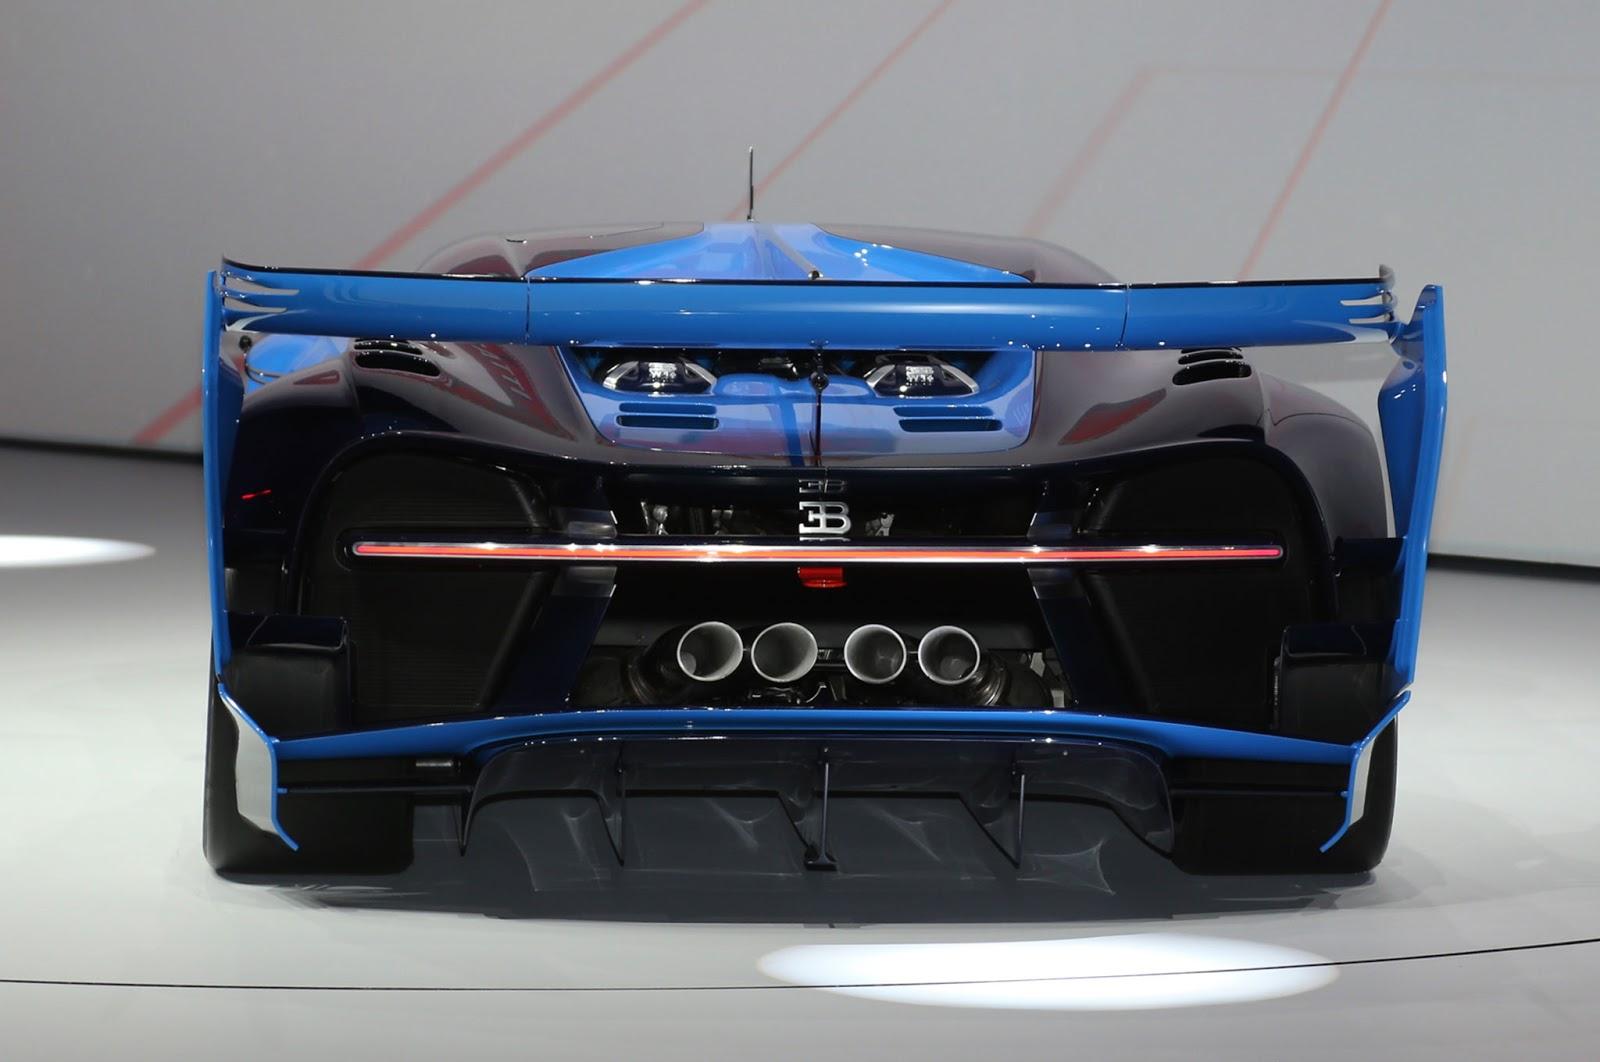 Chiron Bugatti Vision Gt on mitsubishi gt vision, subaru viziv gt vision, renault alpine gt vision, bmw gt vision,